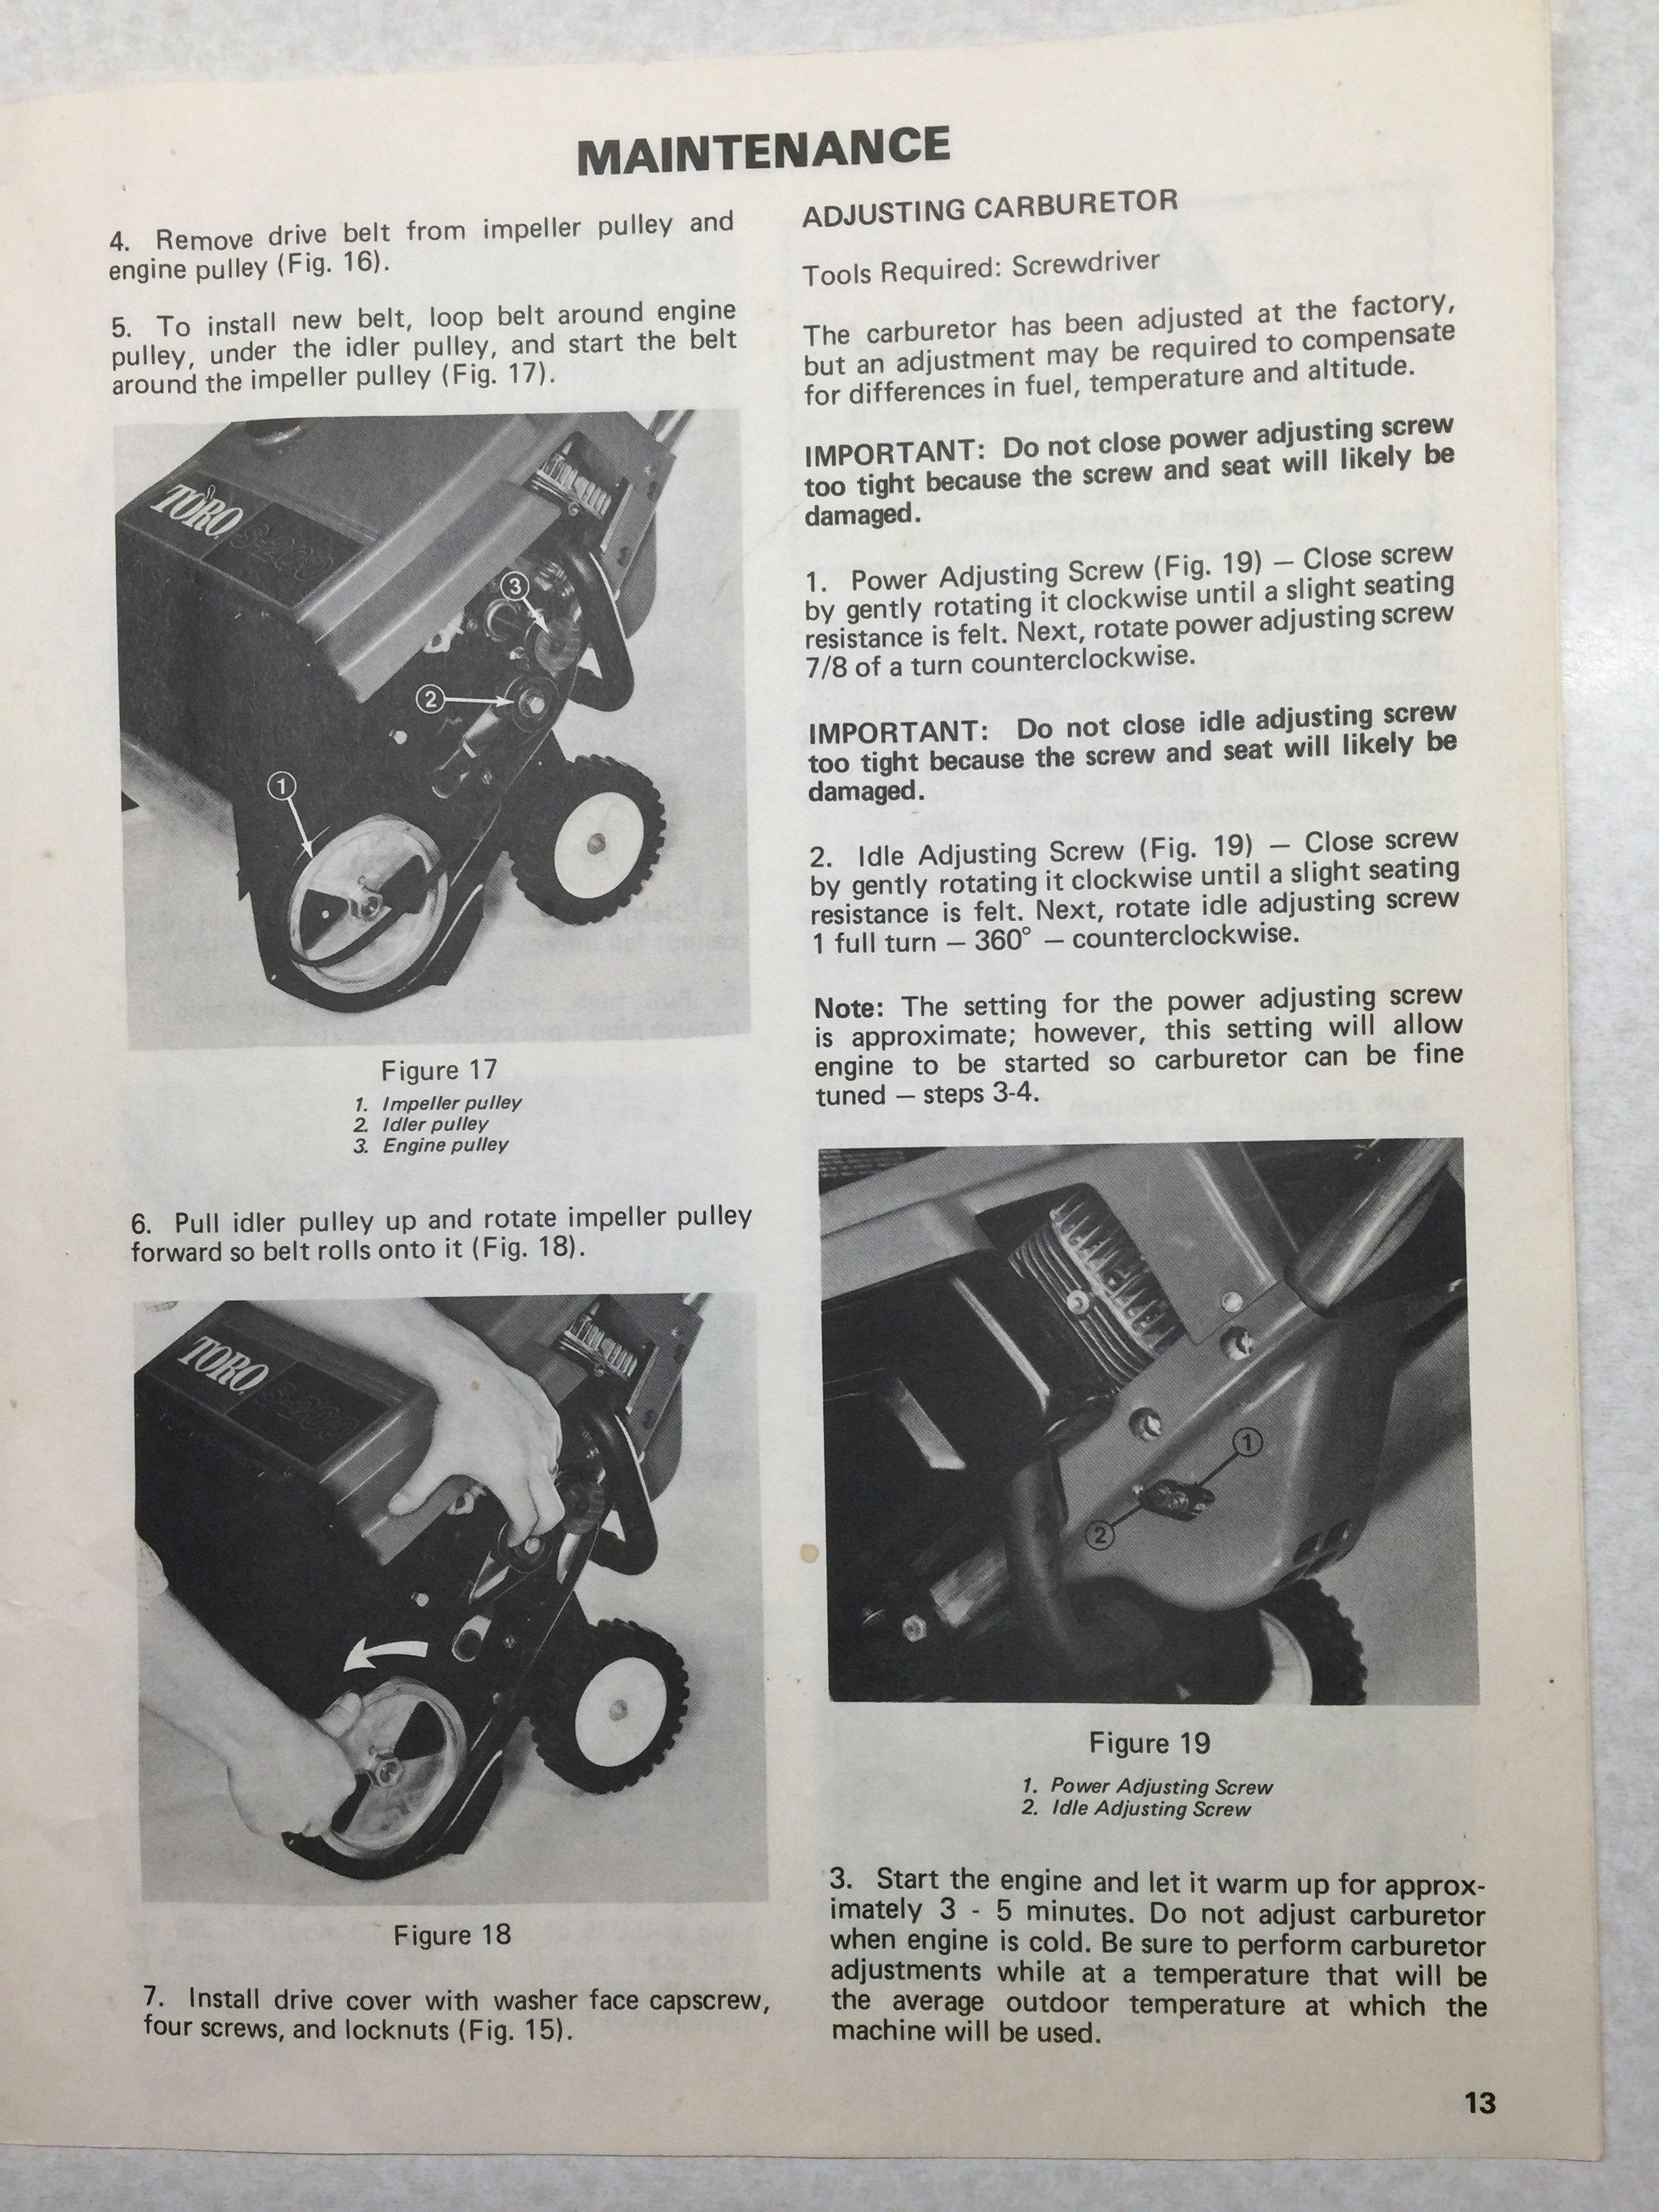 Toro S200 Snower Carb Smartvradar